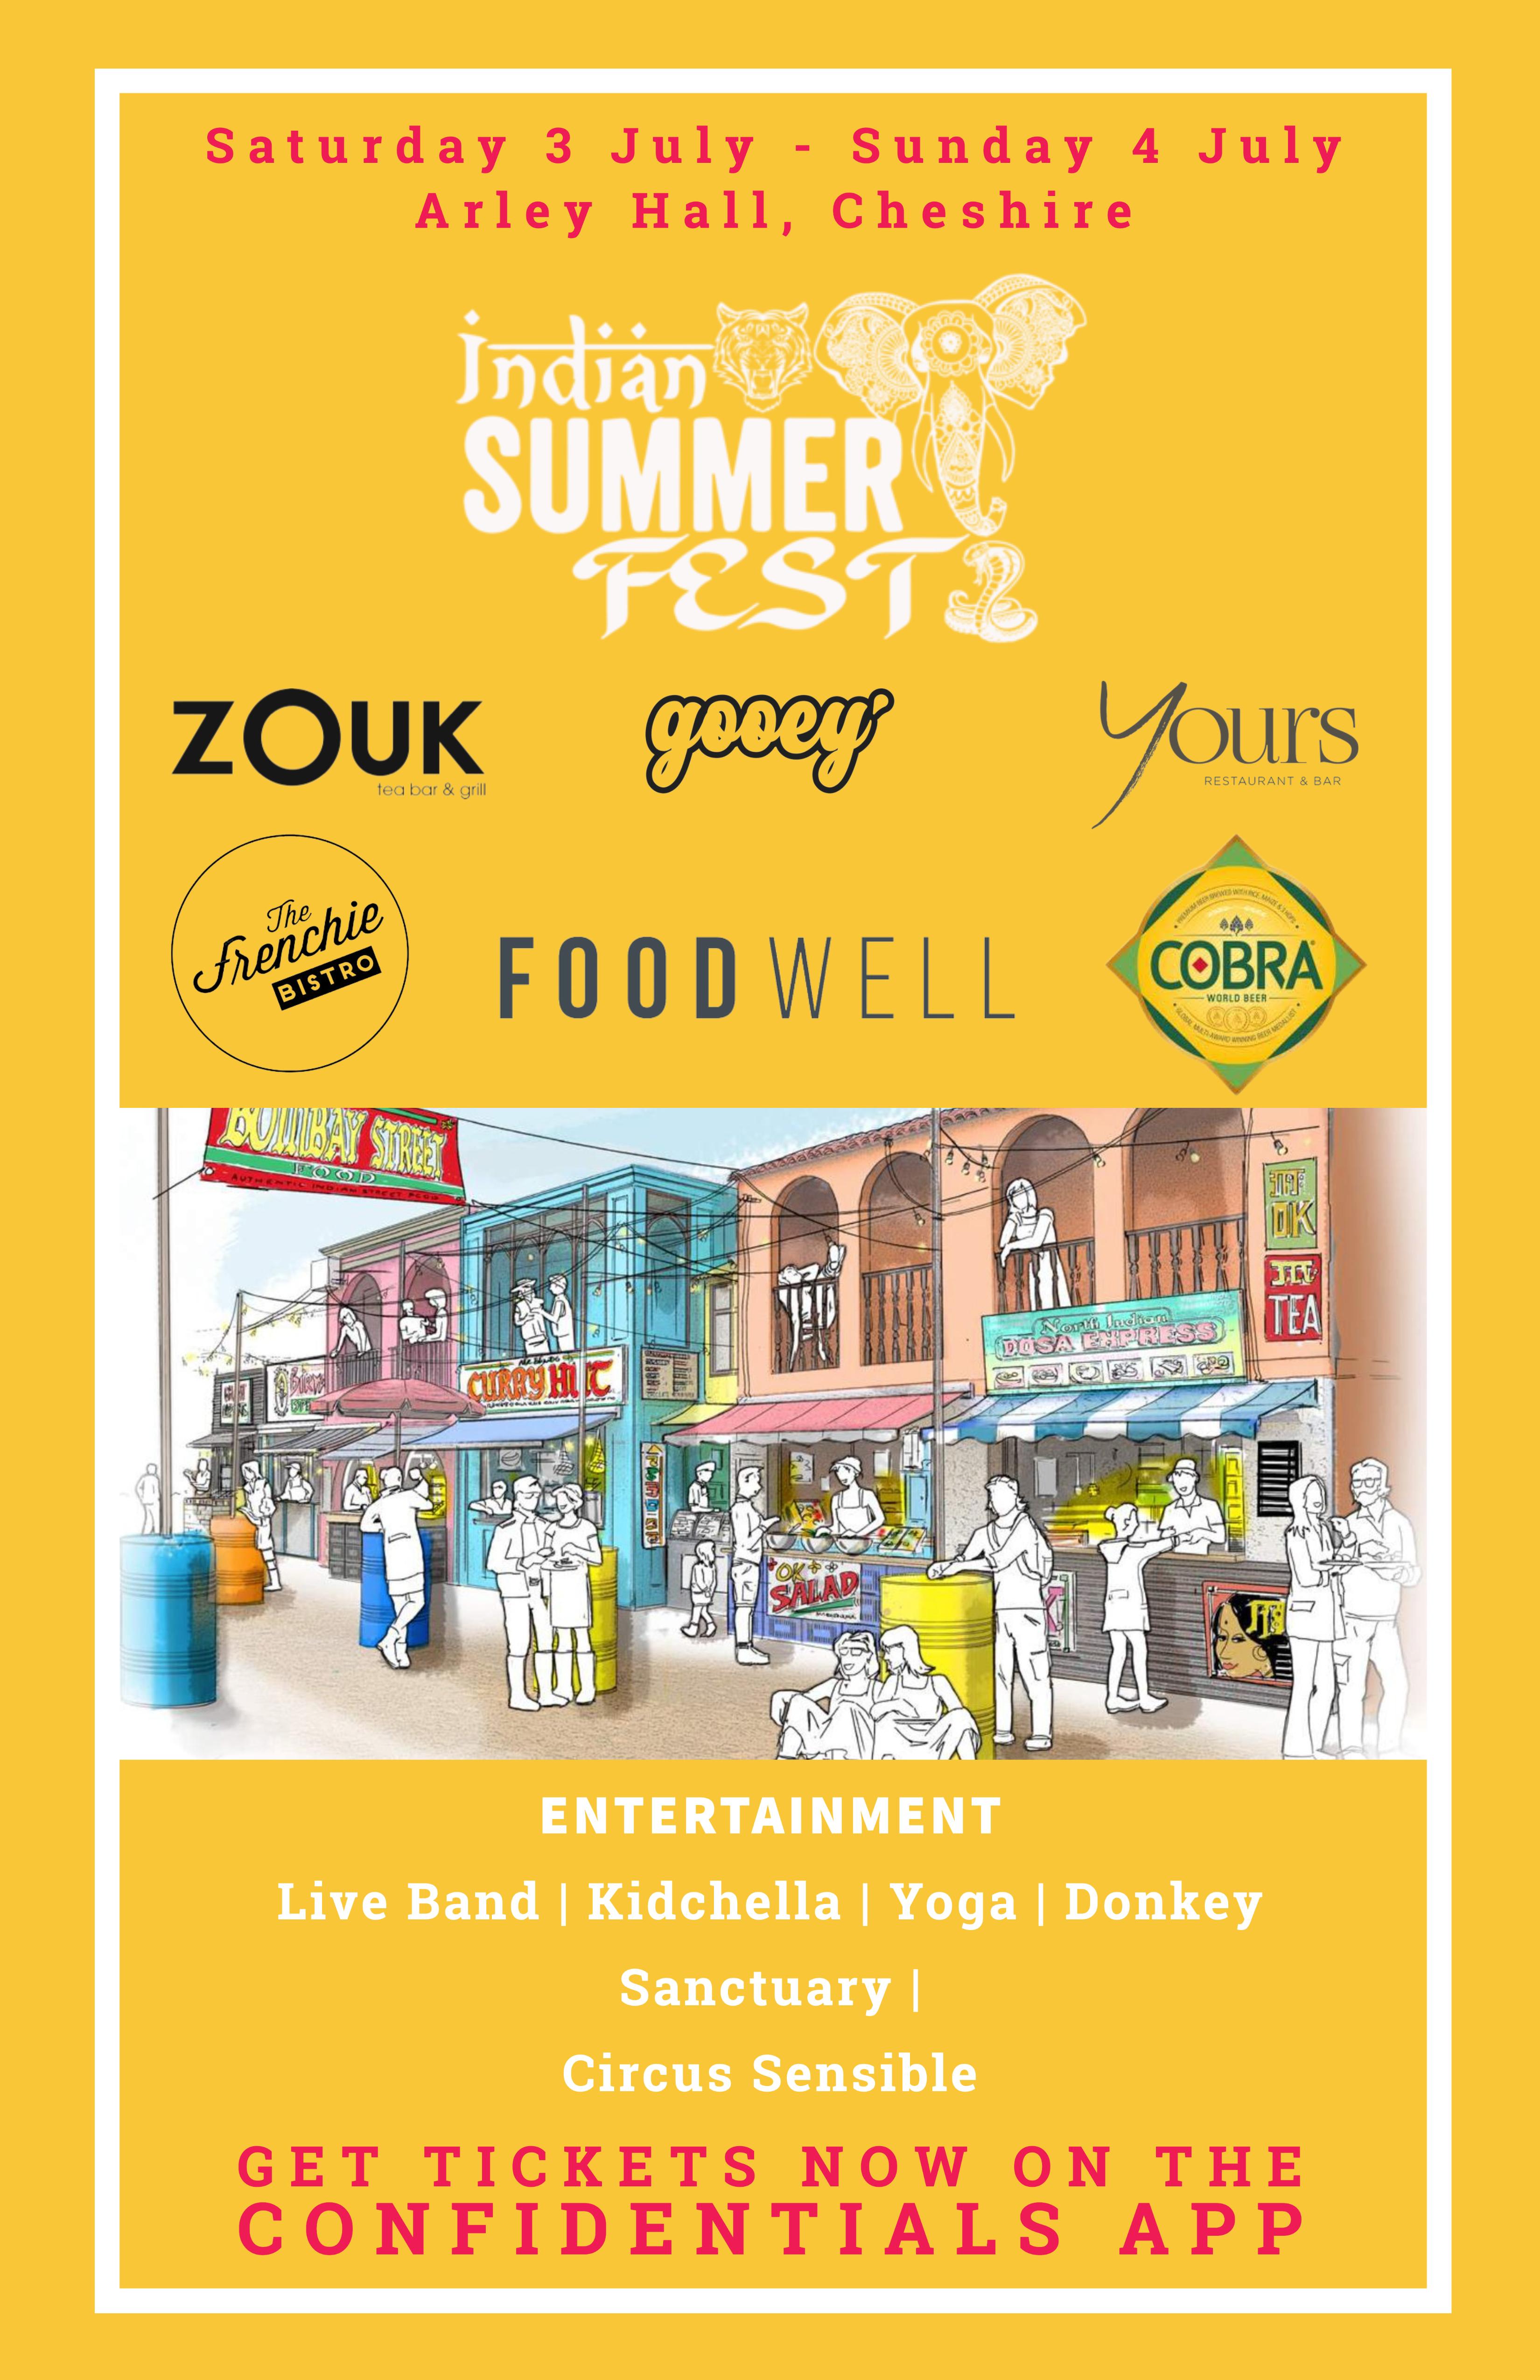 20210609 Indian Summer Fest Poster